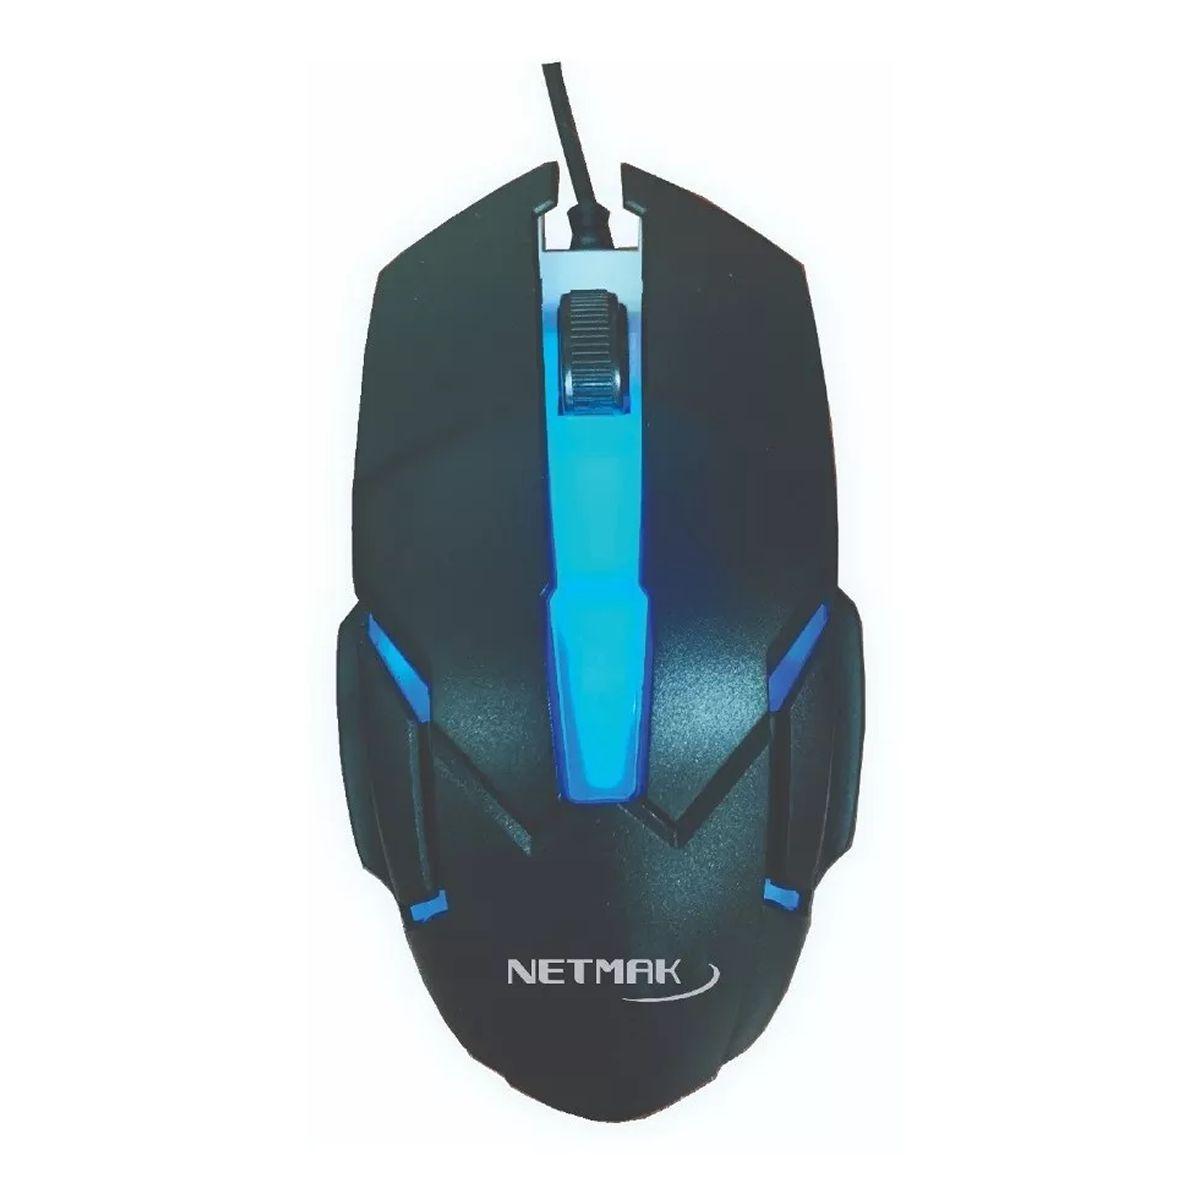 Netmak Mouse Gamer NM-Galax Retroiluminado 800DPI